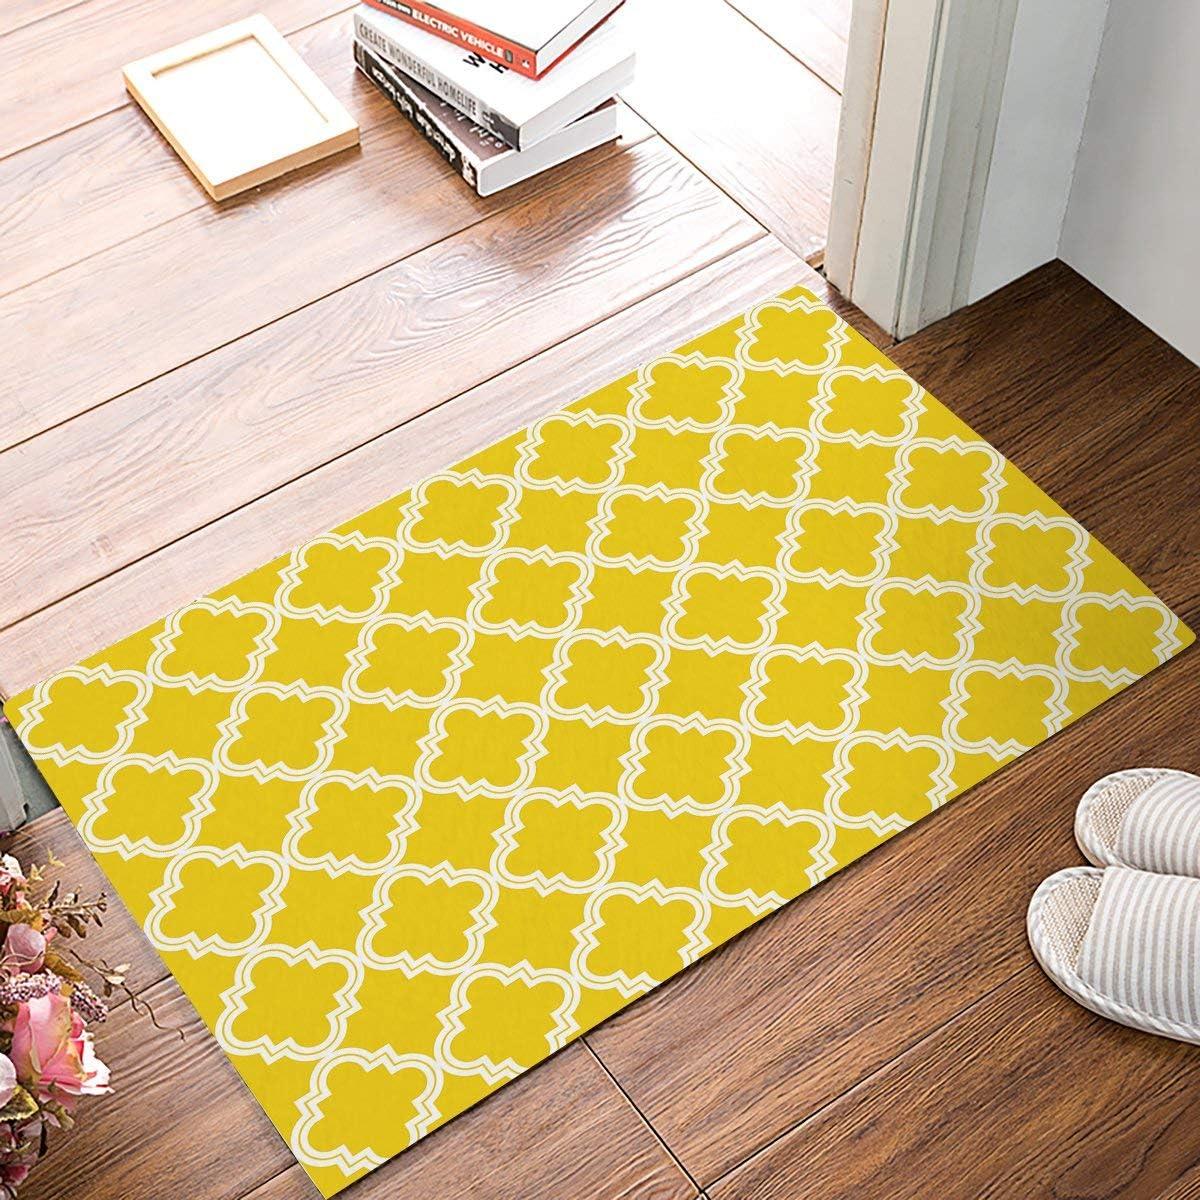 SIMIGREE 9 x 9 Inch Modern Yellow and White Lattice Door Mats Kitchen  Floor Bath Entrance Rug Mat Absorbent Indoor Bathroom Decor Doormats Rubber  ...